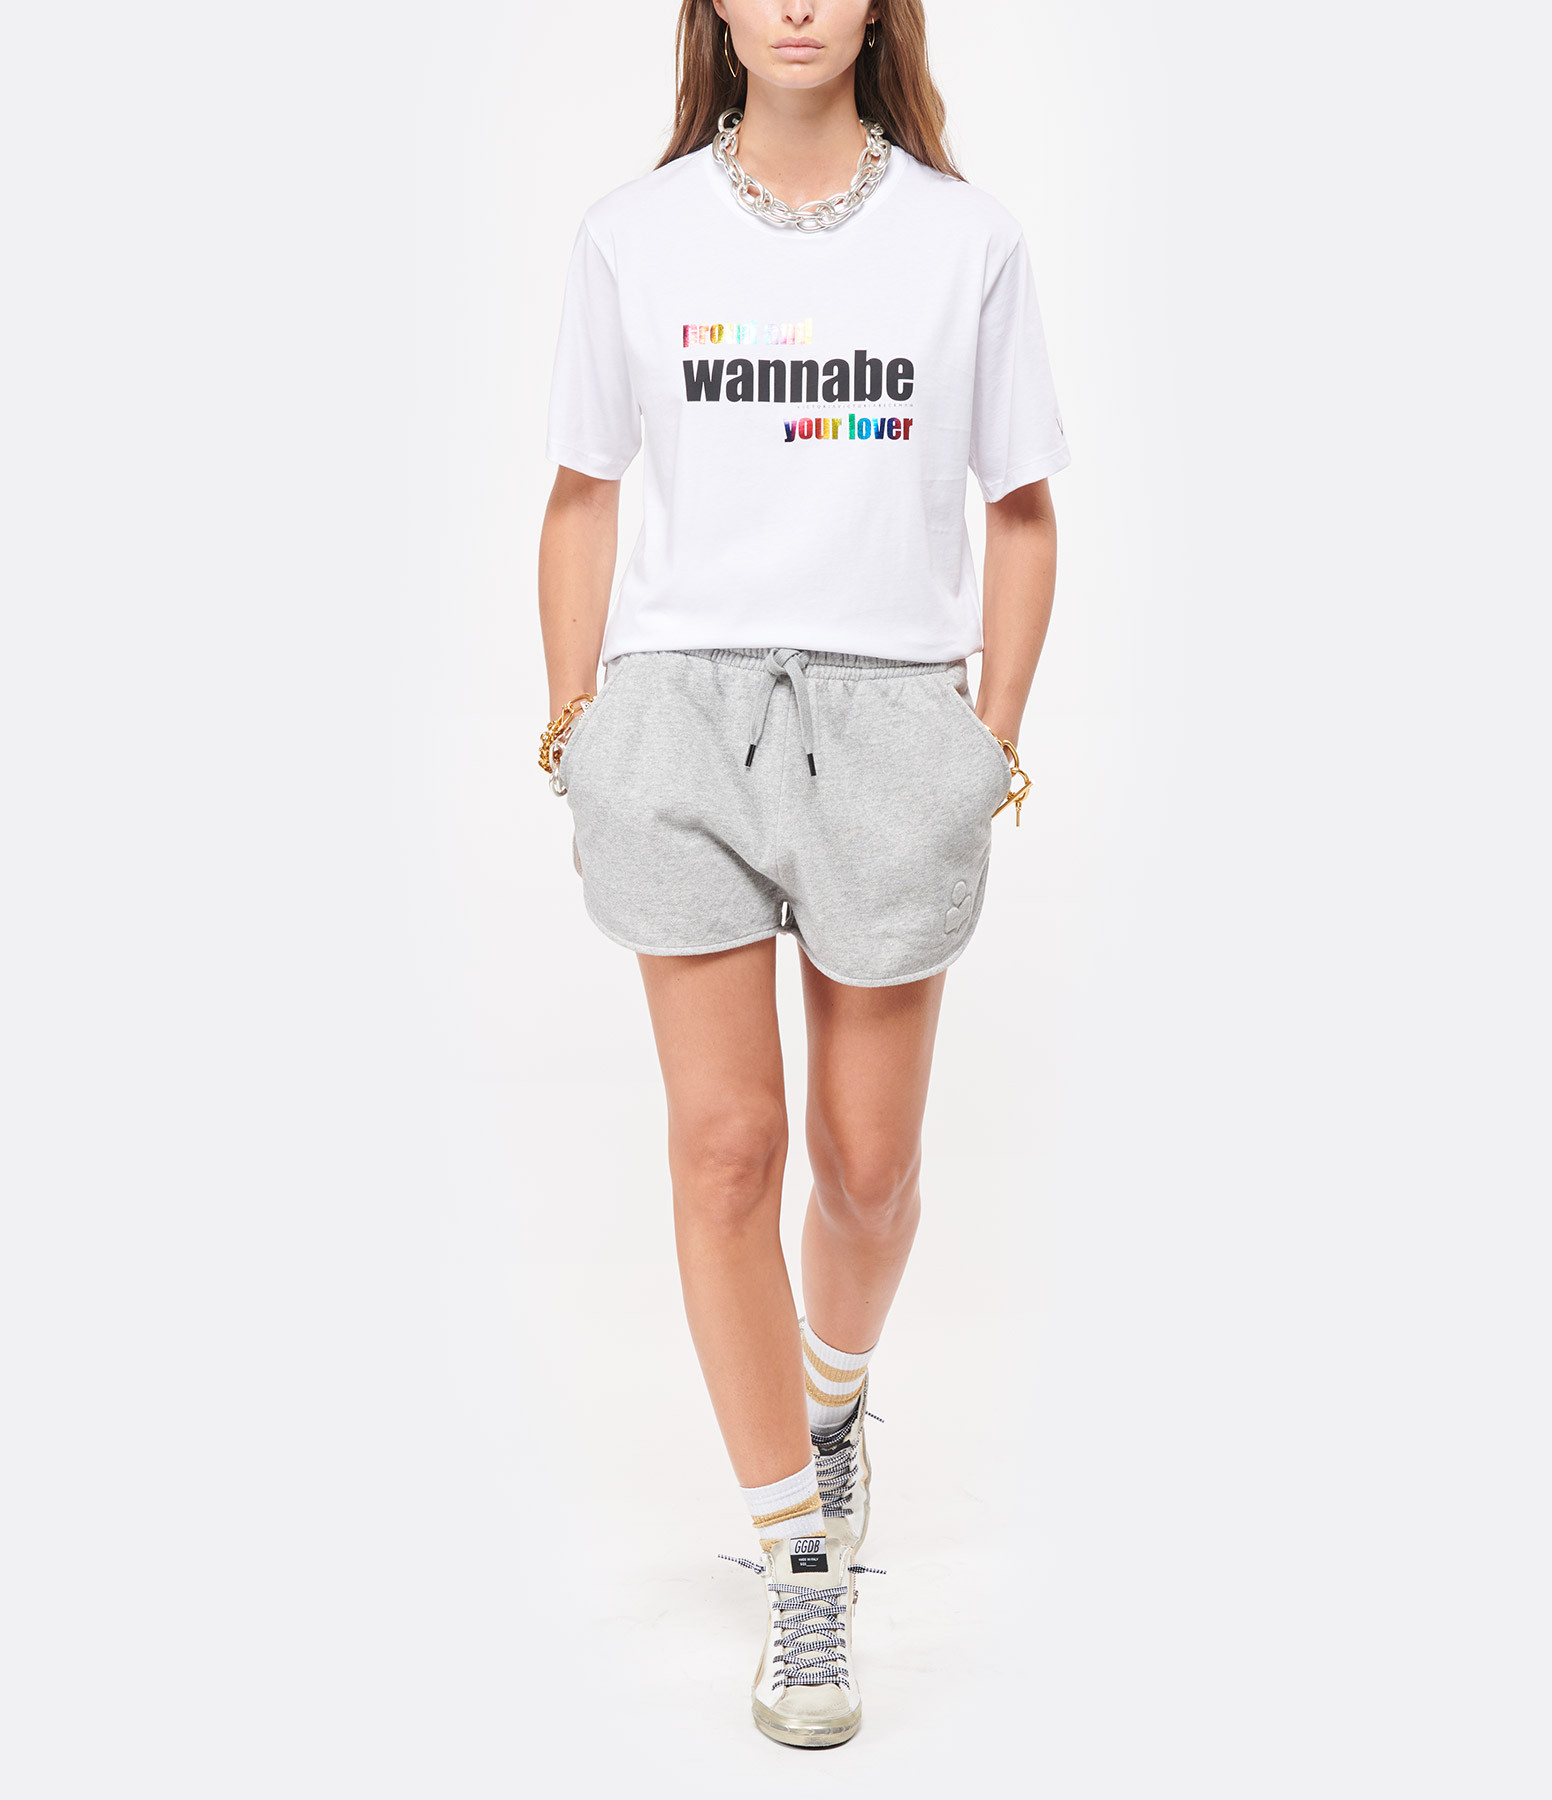 VICTORIA VICTORIA BECKHAM - Tee-shirt Wannabe Blanc, Capsule Spice Girls